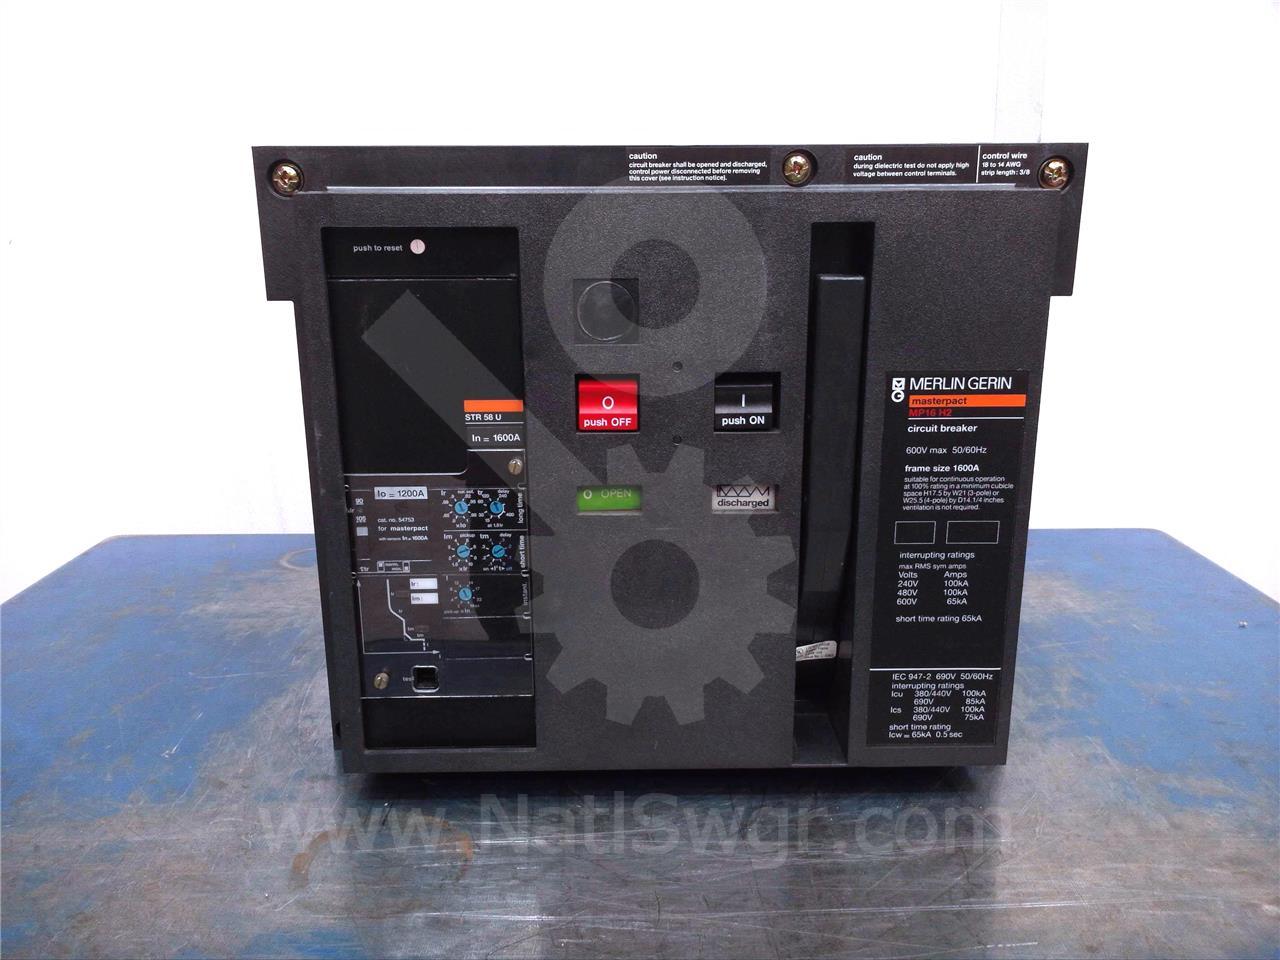 MP16 H2 1600A SQD Merlin Gerin MO/DO 120VAC TRIP, STR58U LSI, 1600A CT, 1200A RP